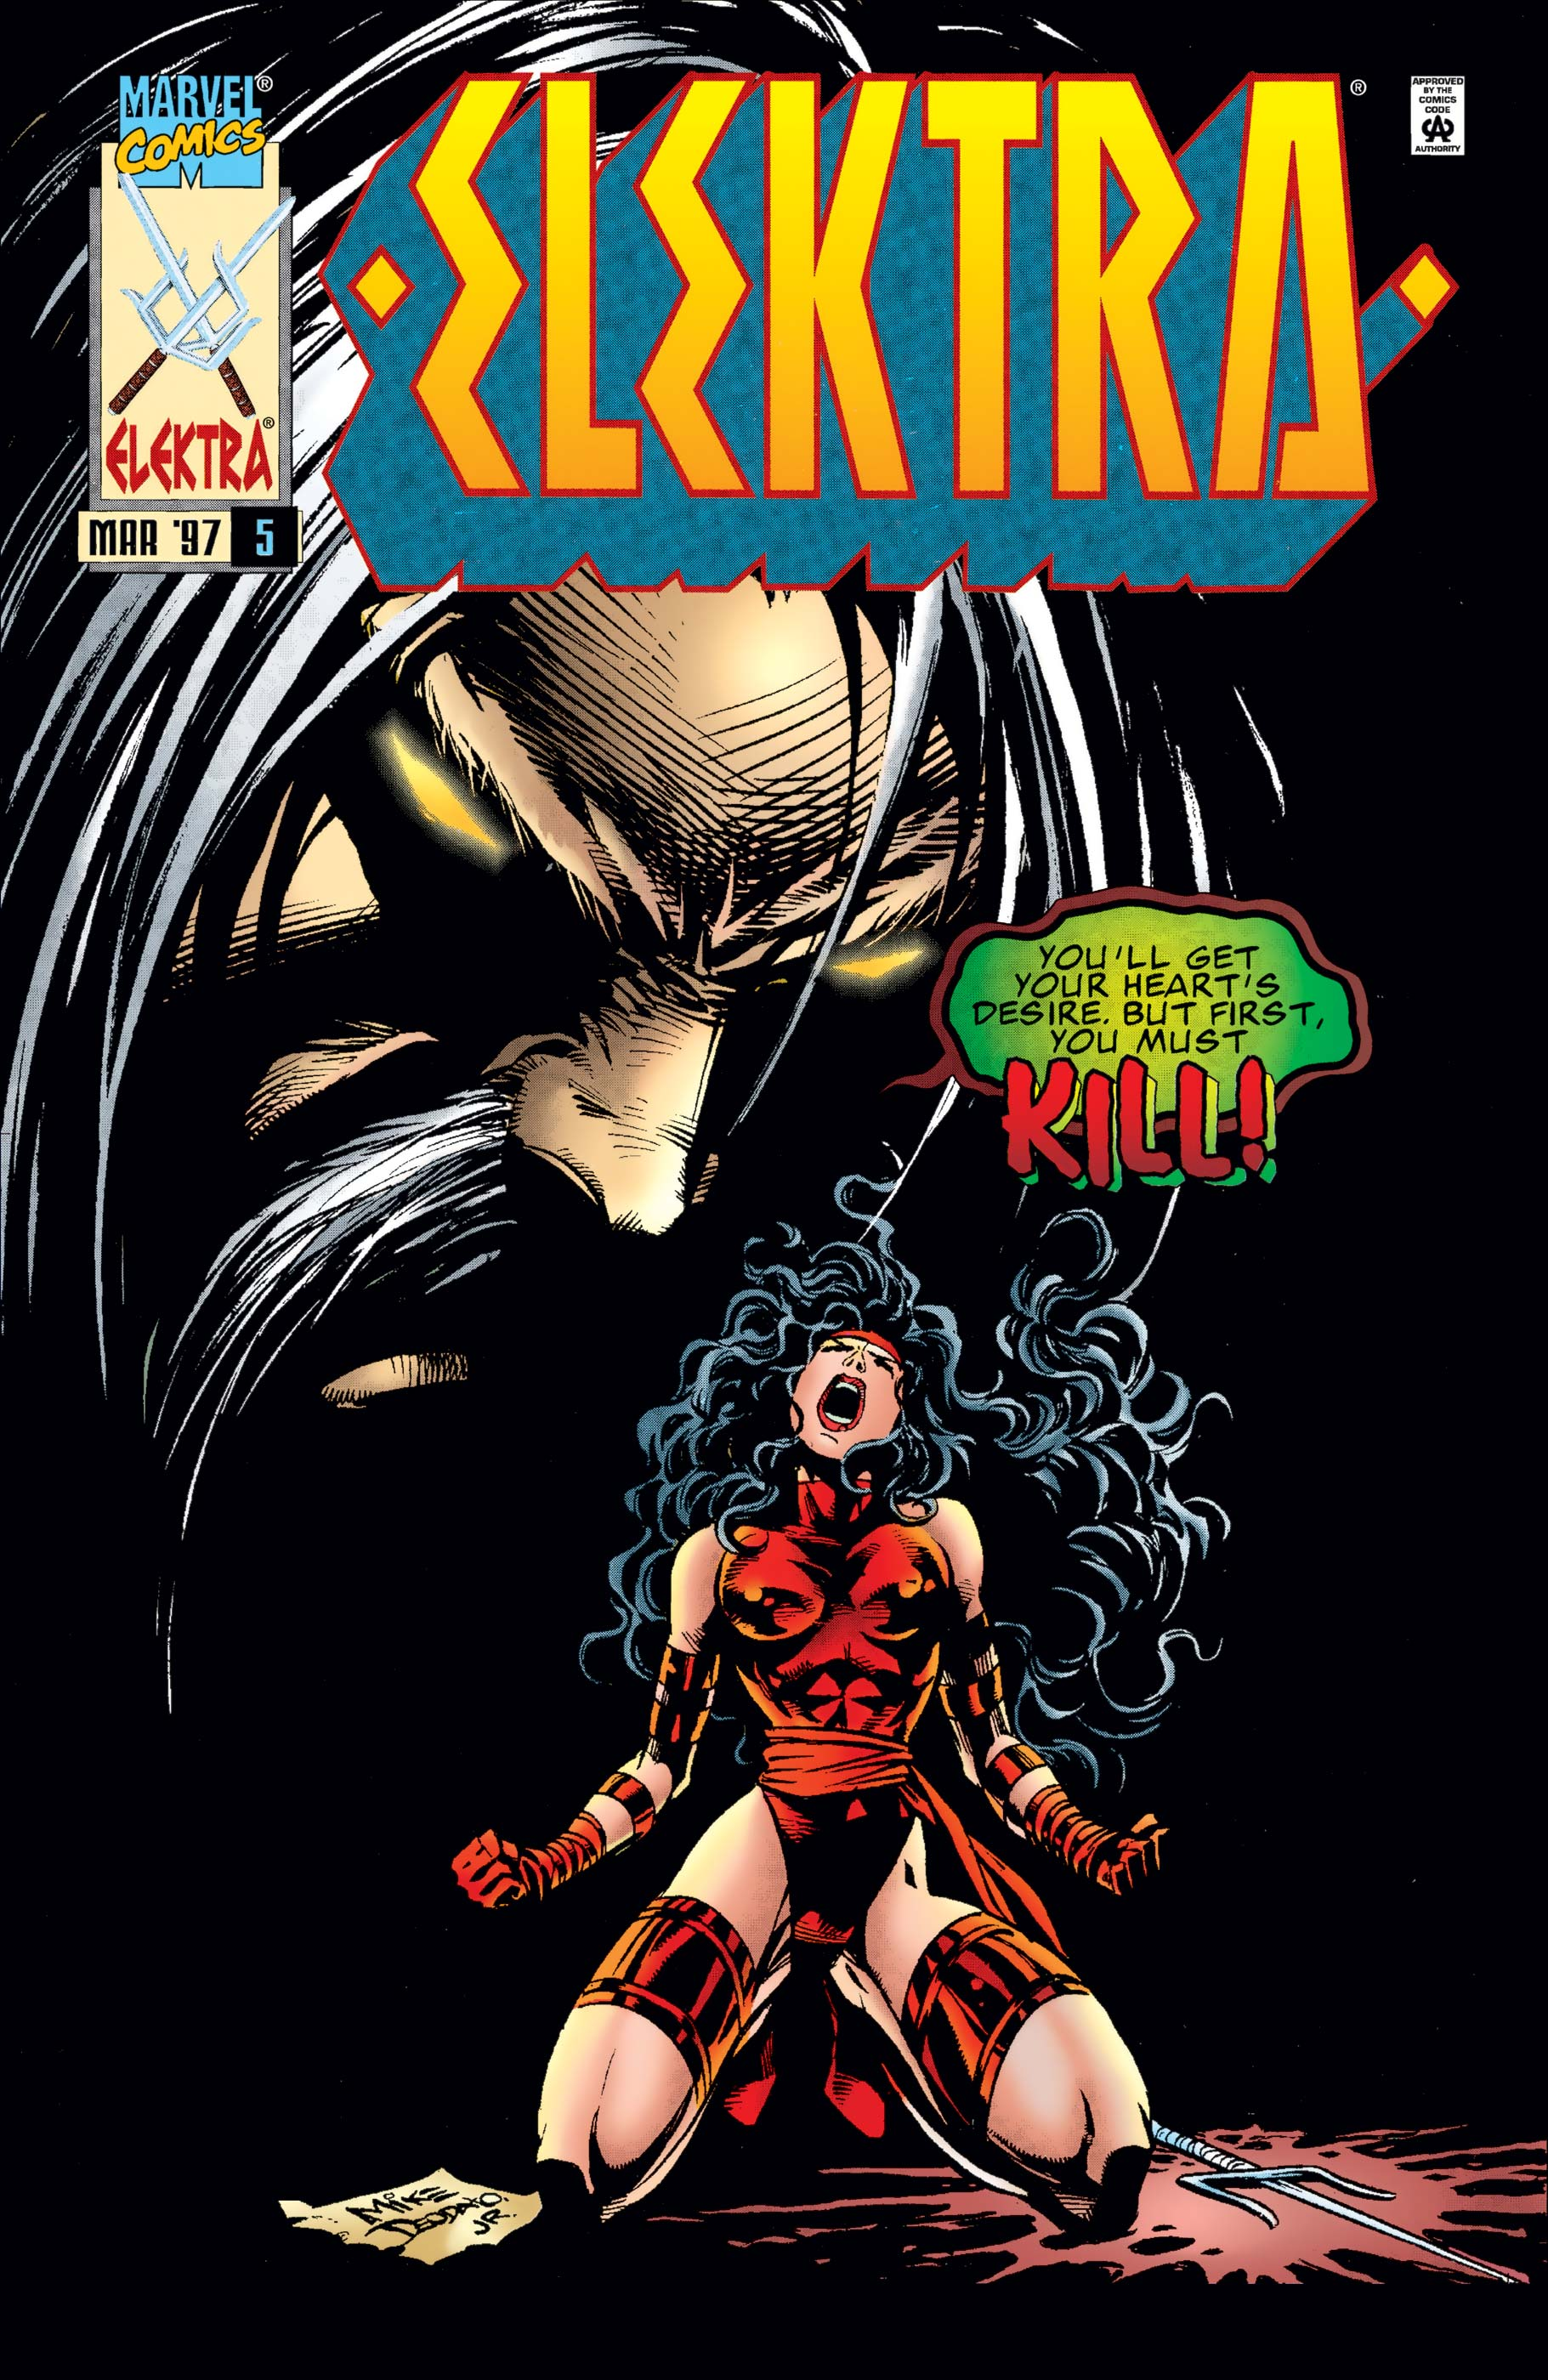 Elektra (1996) #5